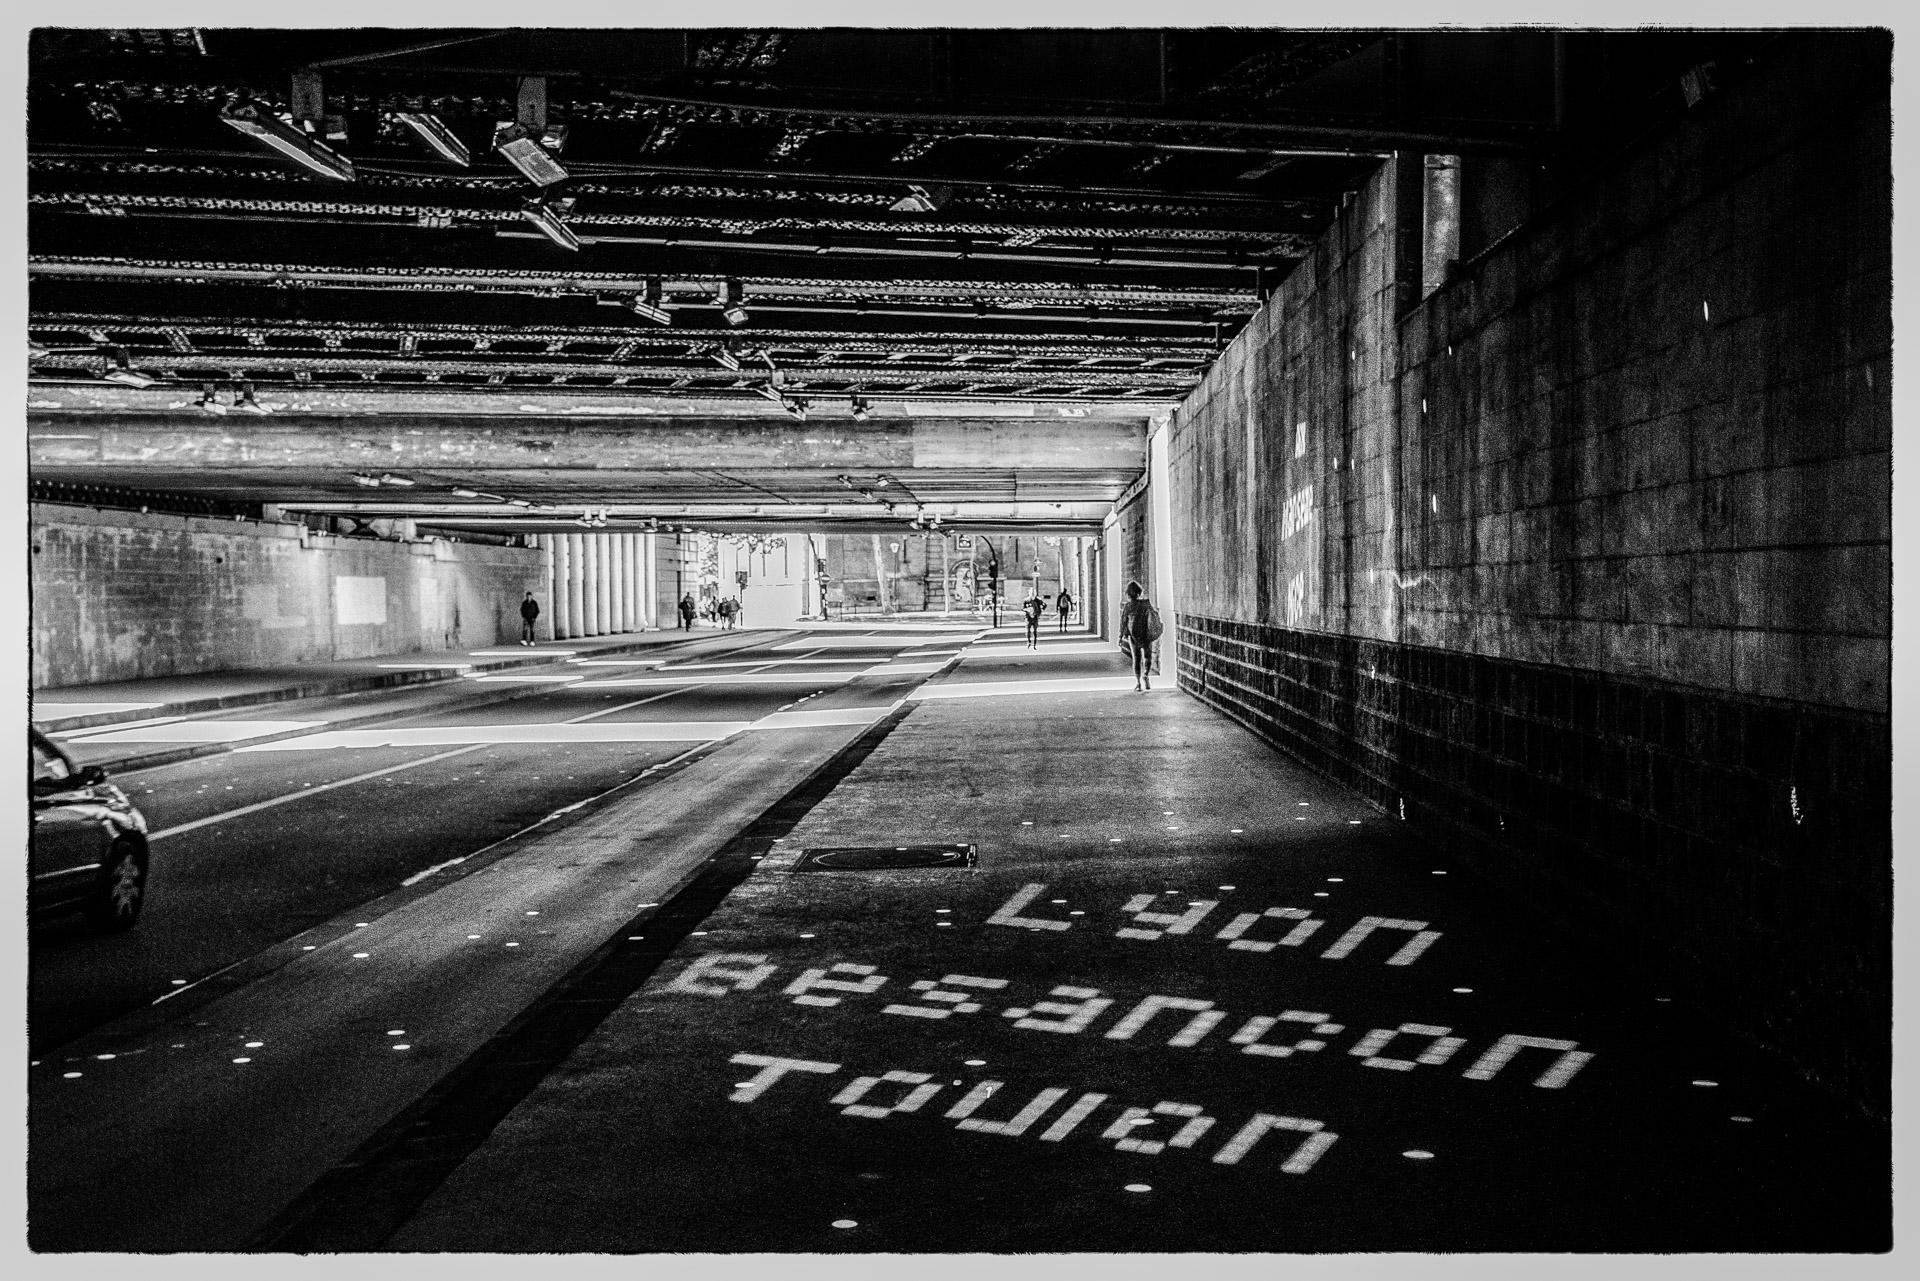 Parisian Underground